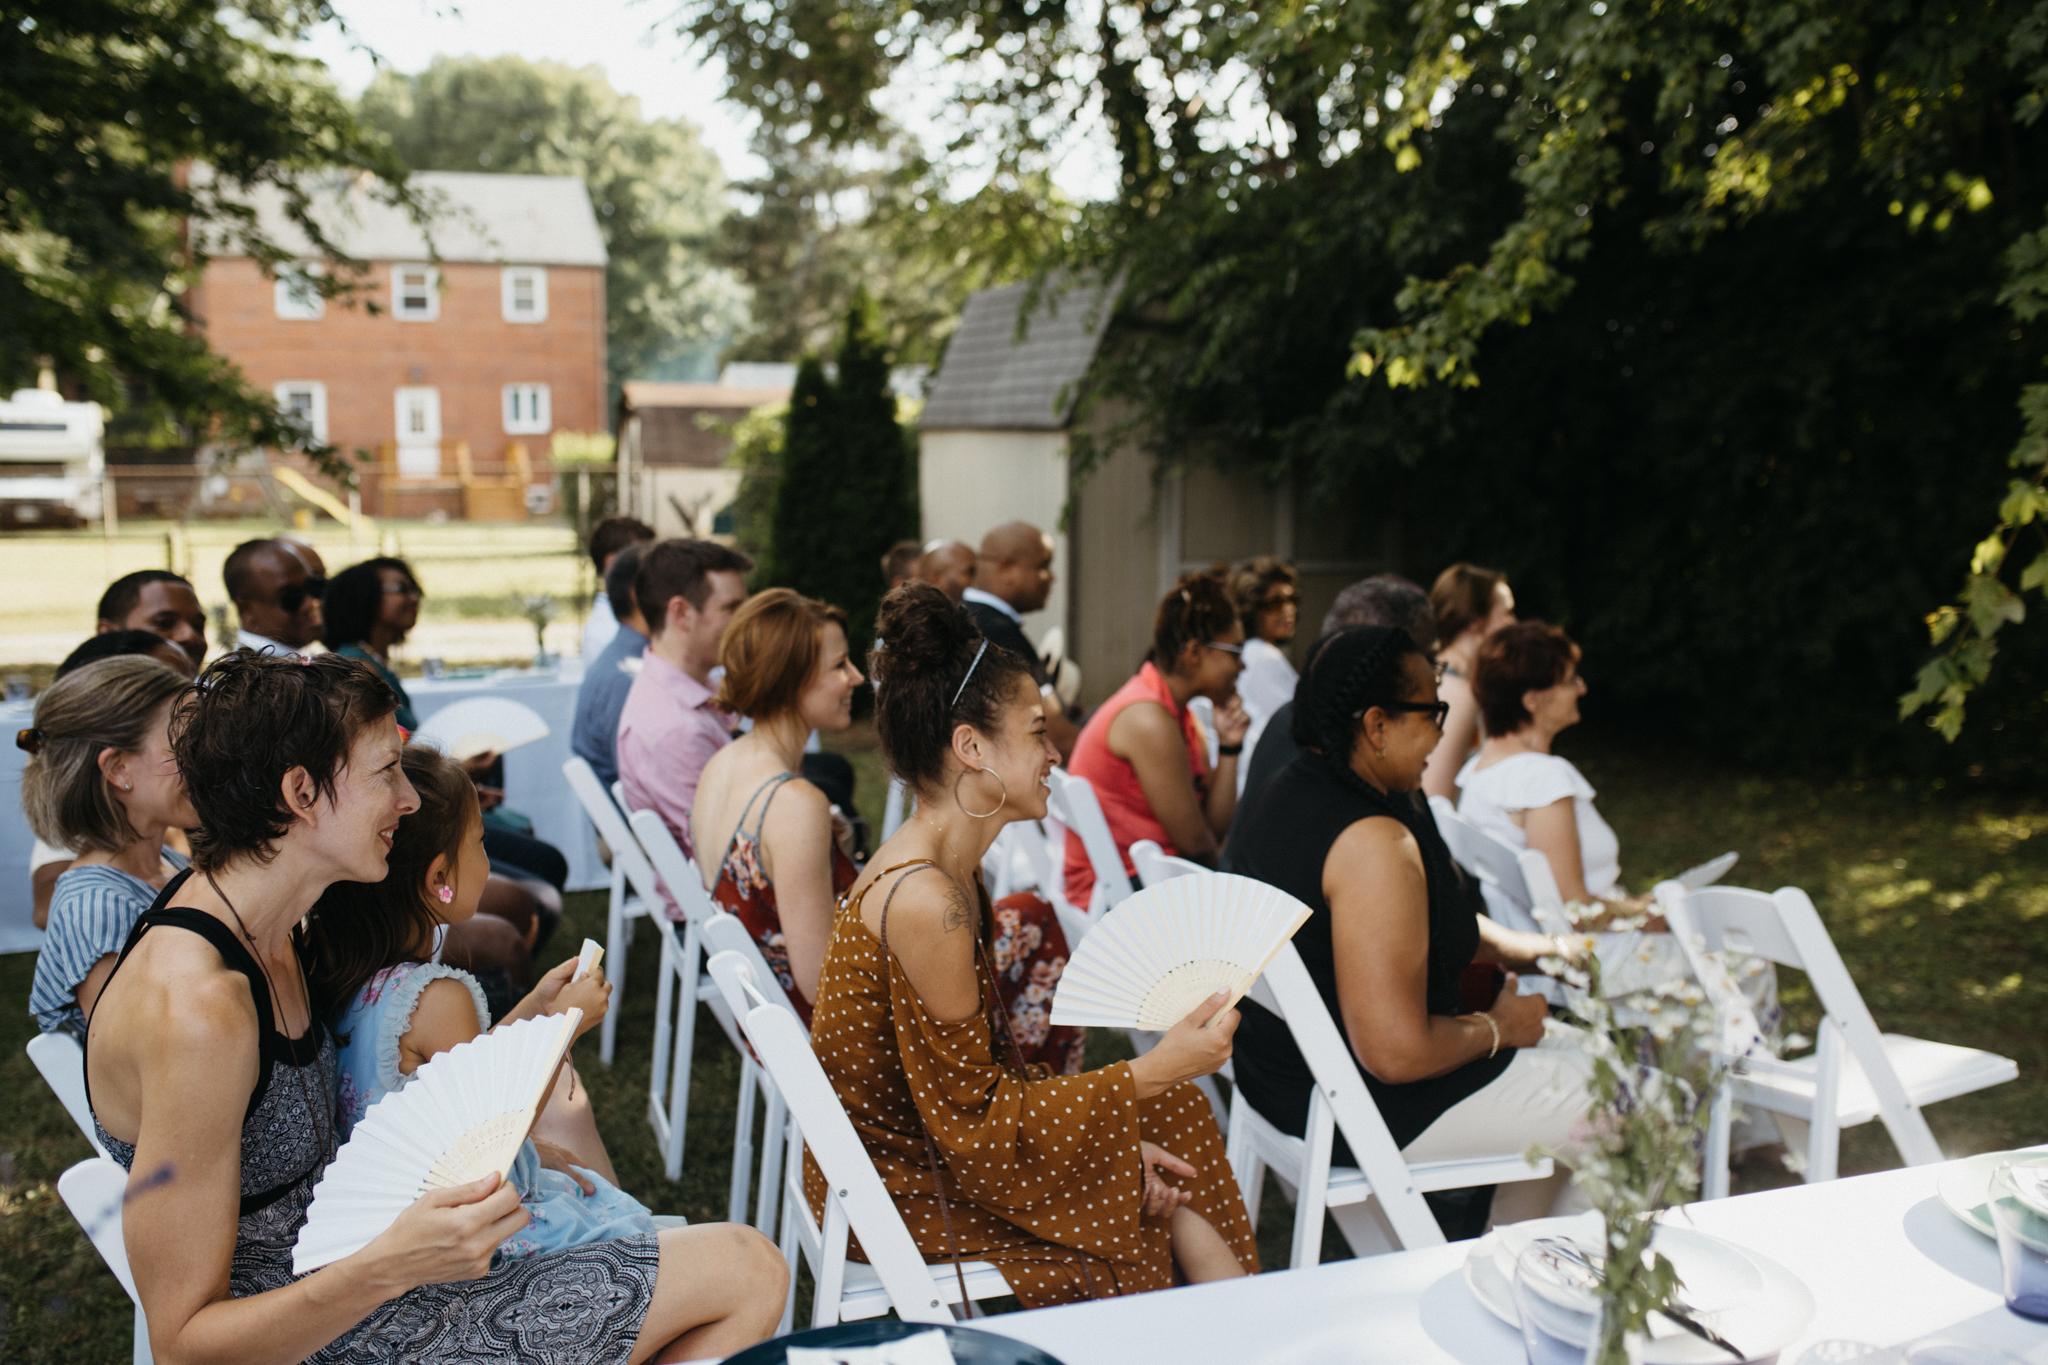 dorota_dwight_richmond_backyard_wedding-44.jpg